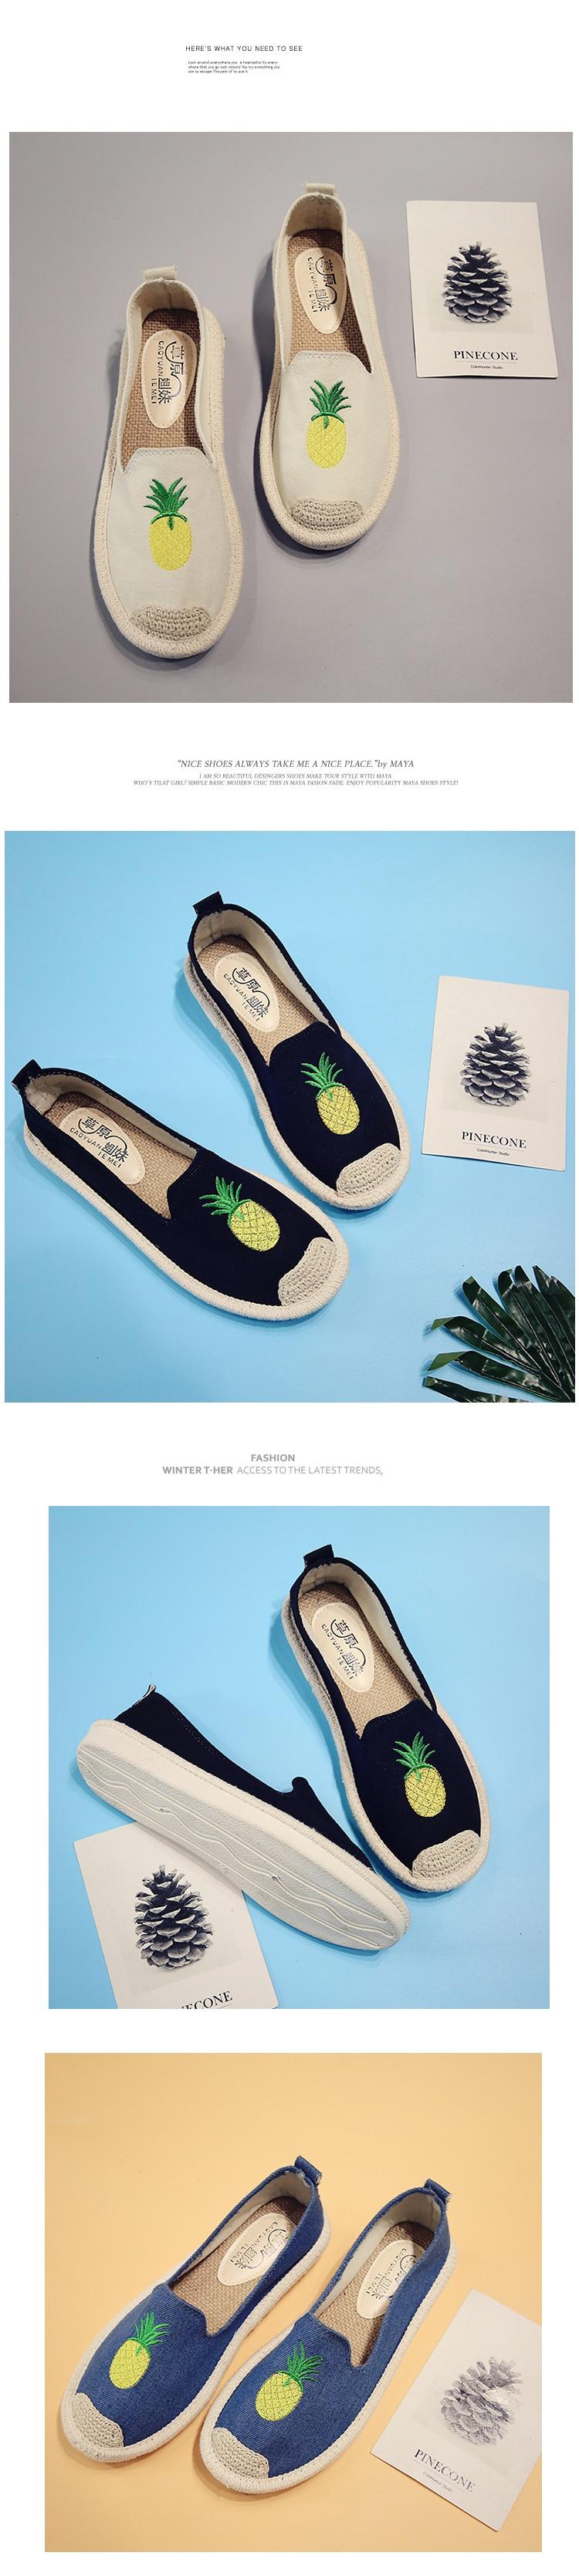 e597633c1 حذاء كاجوال بناتي نسواني فاشن 2018 تشكيلة صيفيه جديدة – TSWQ | تسوق